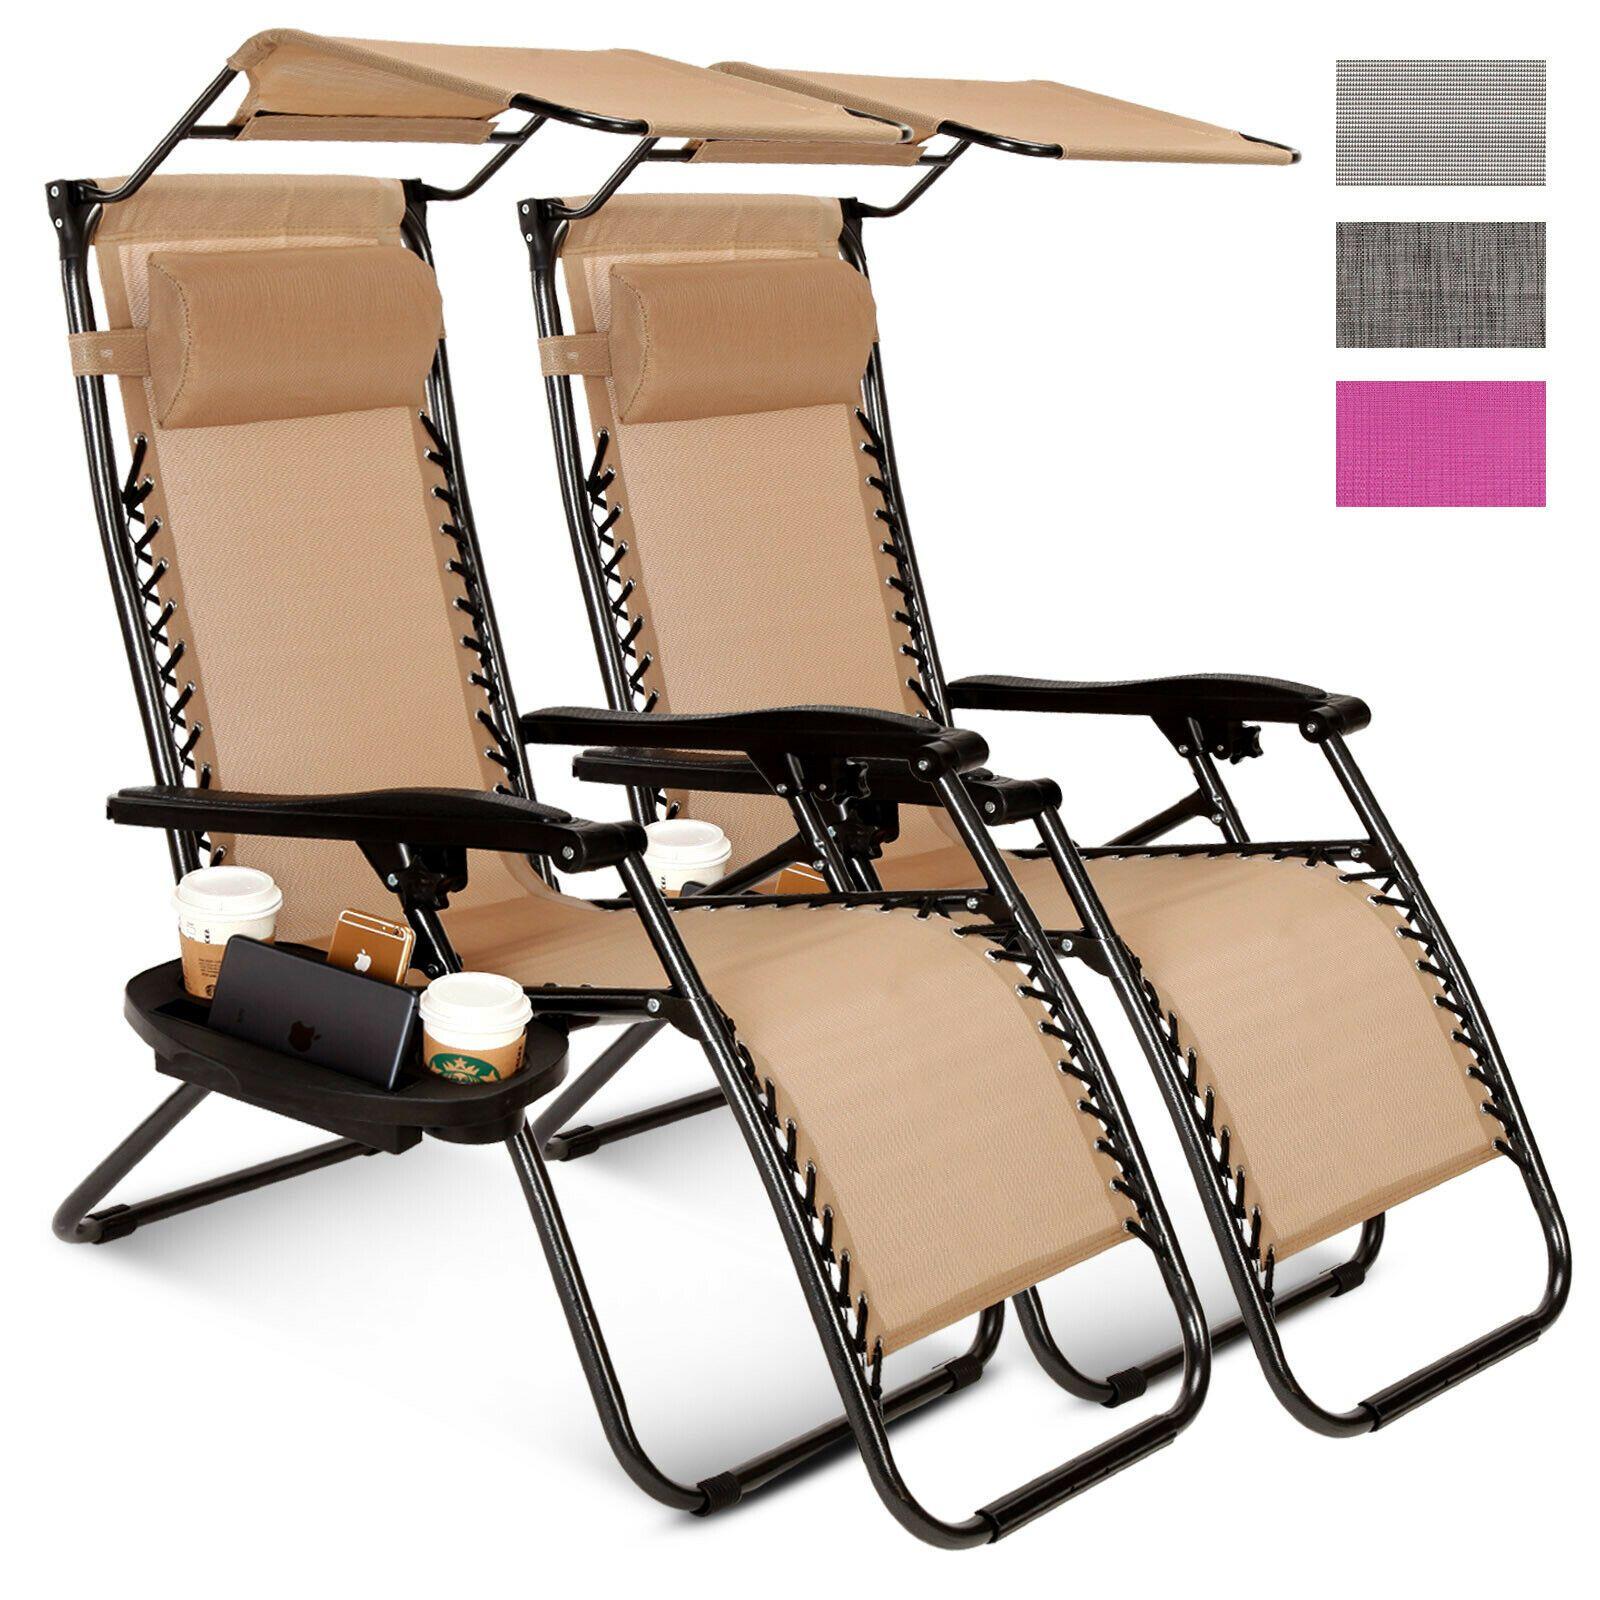 Park Art|My WordPress Blog_Zero Gravity Chair With Cup Holder Menards